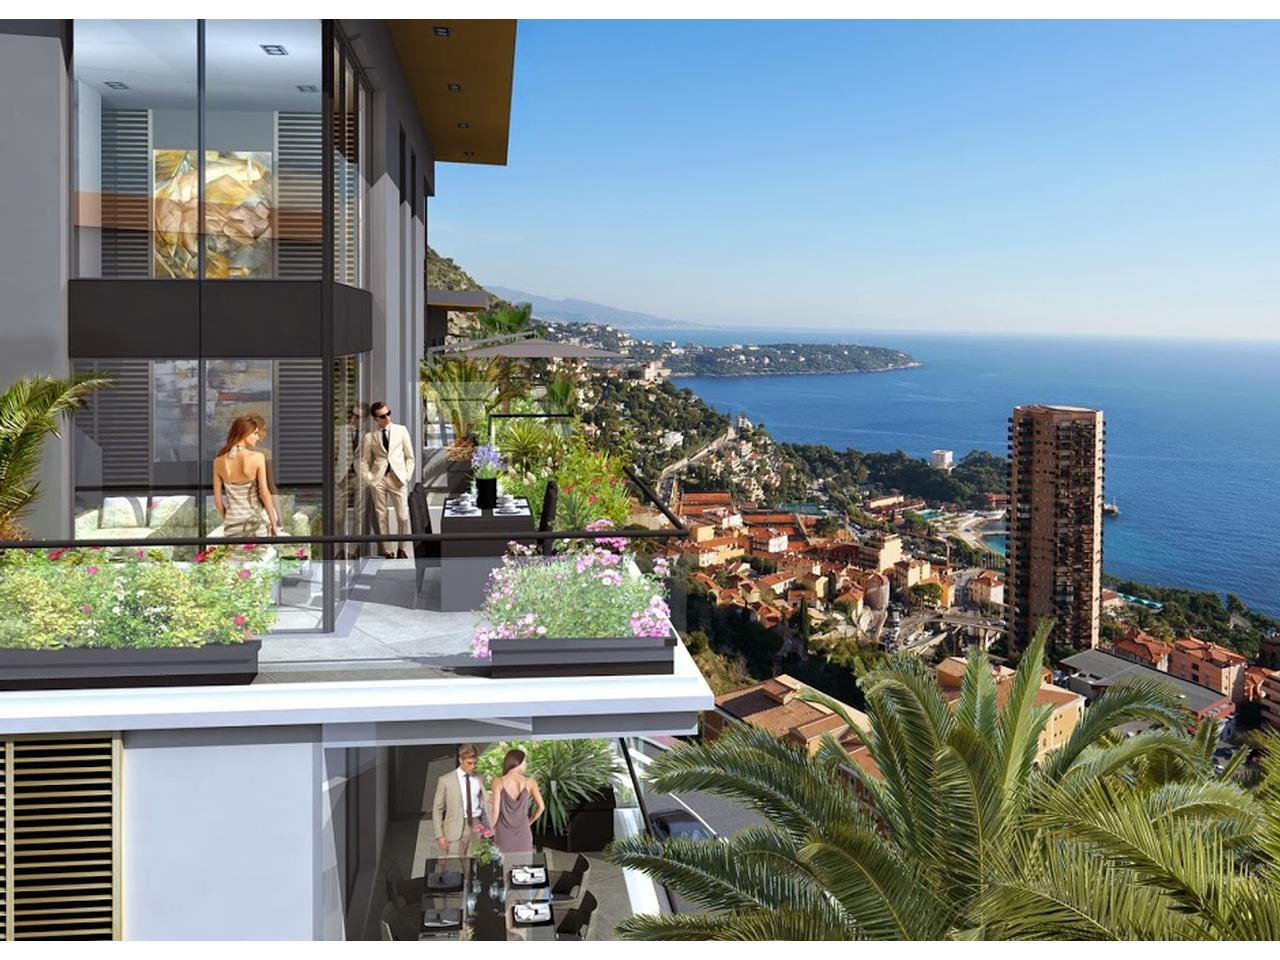 Nice vue mer immobilier appartements et villas vue mer for Terrasse et cie immobilier